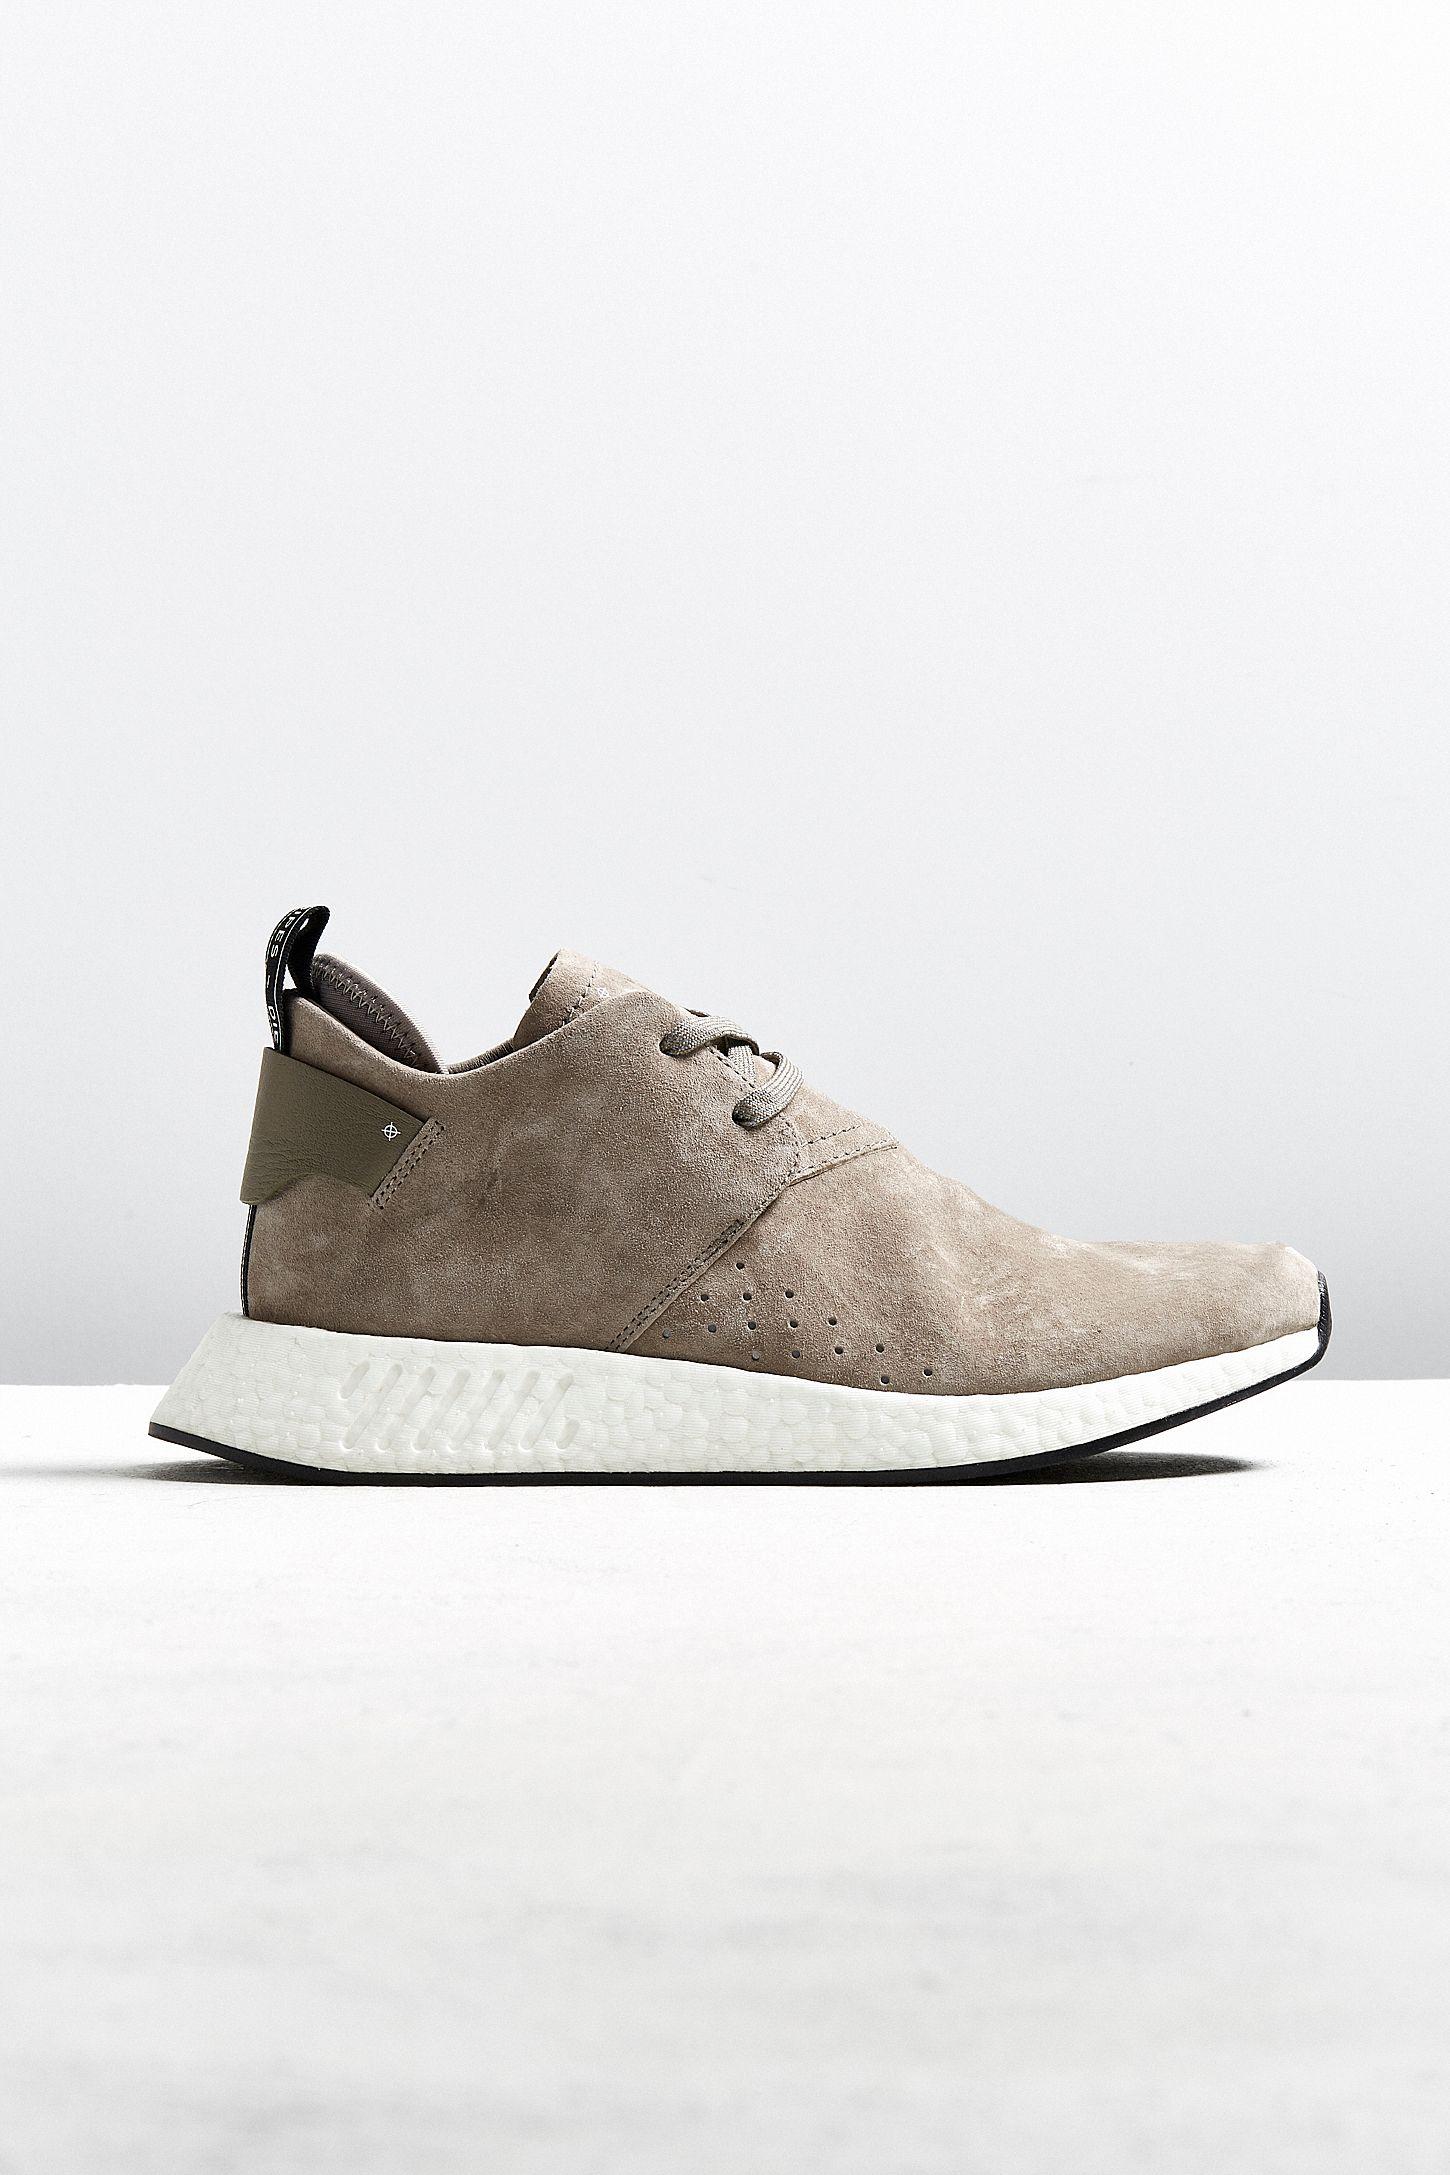 5da669a55 adidas NMD C2 Suede Sneaker